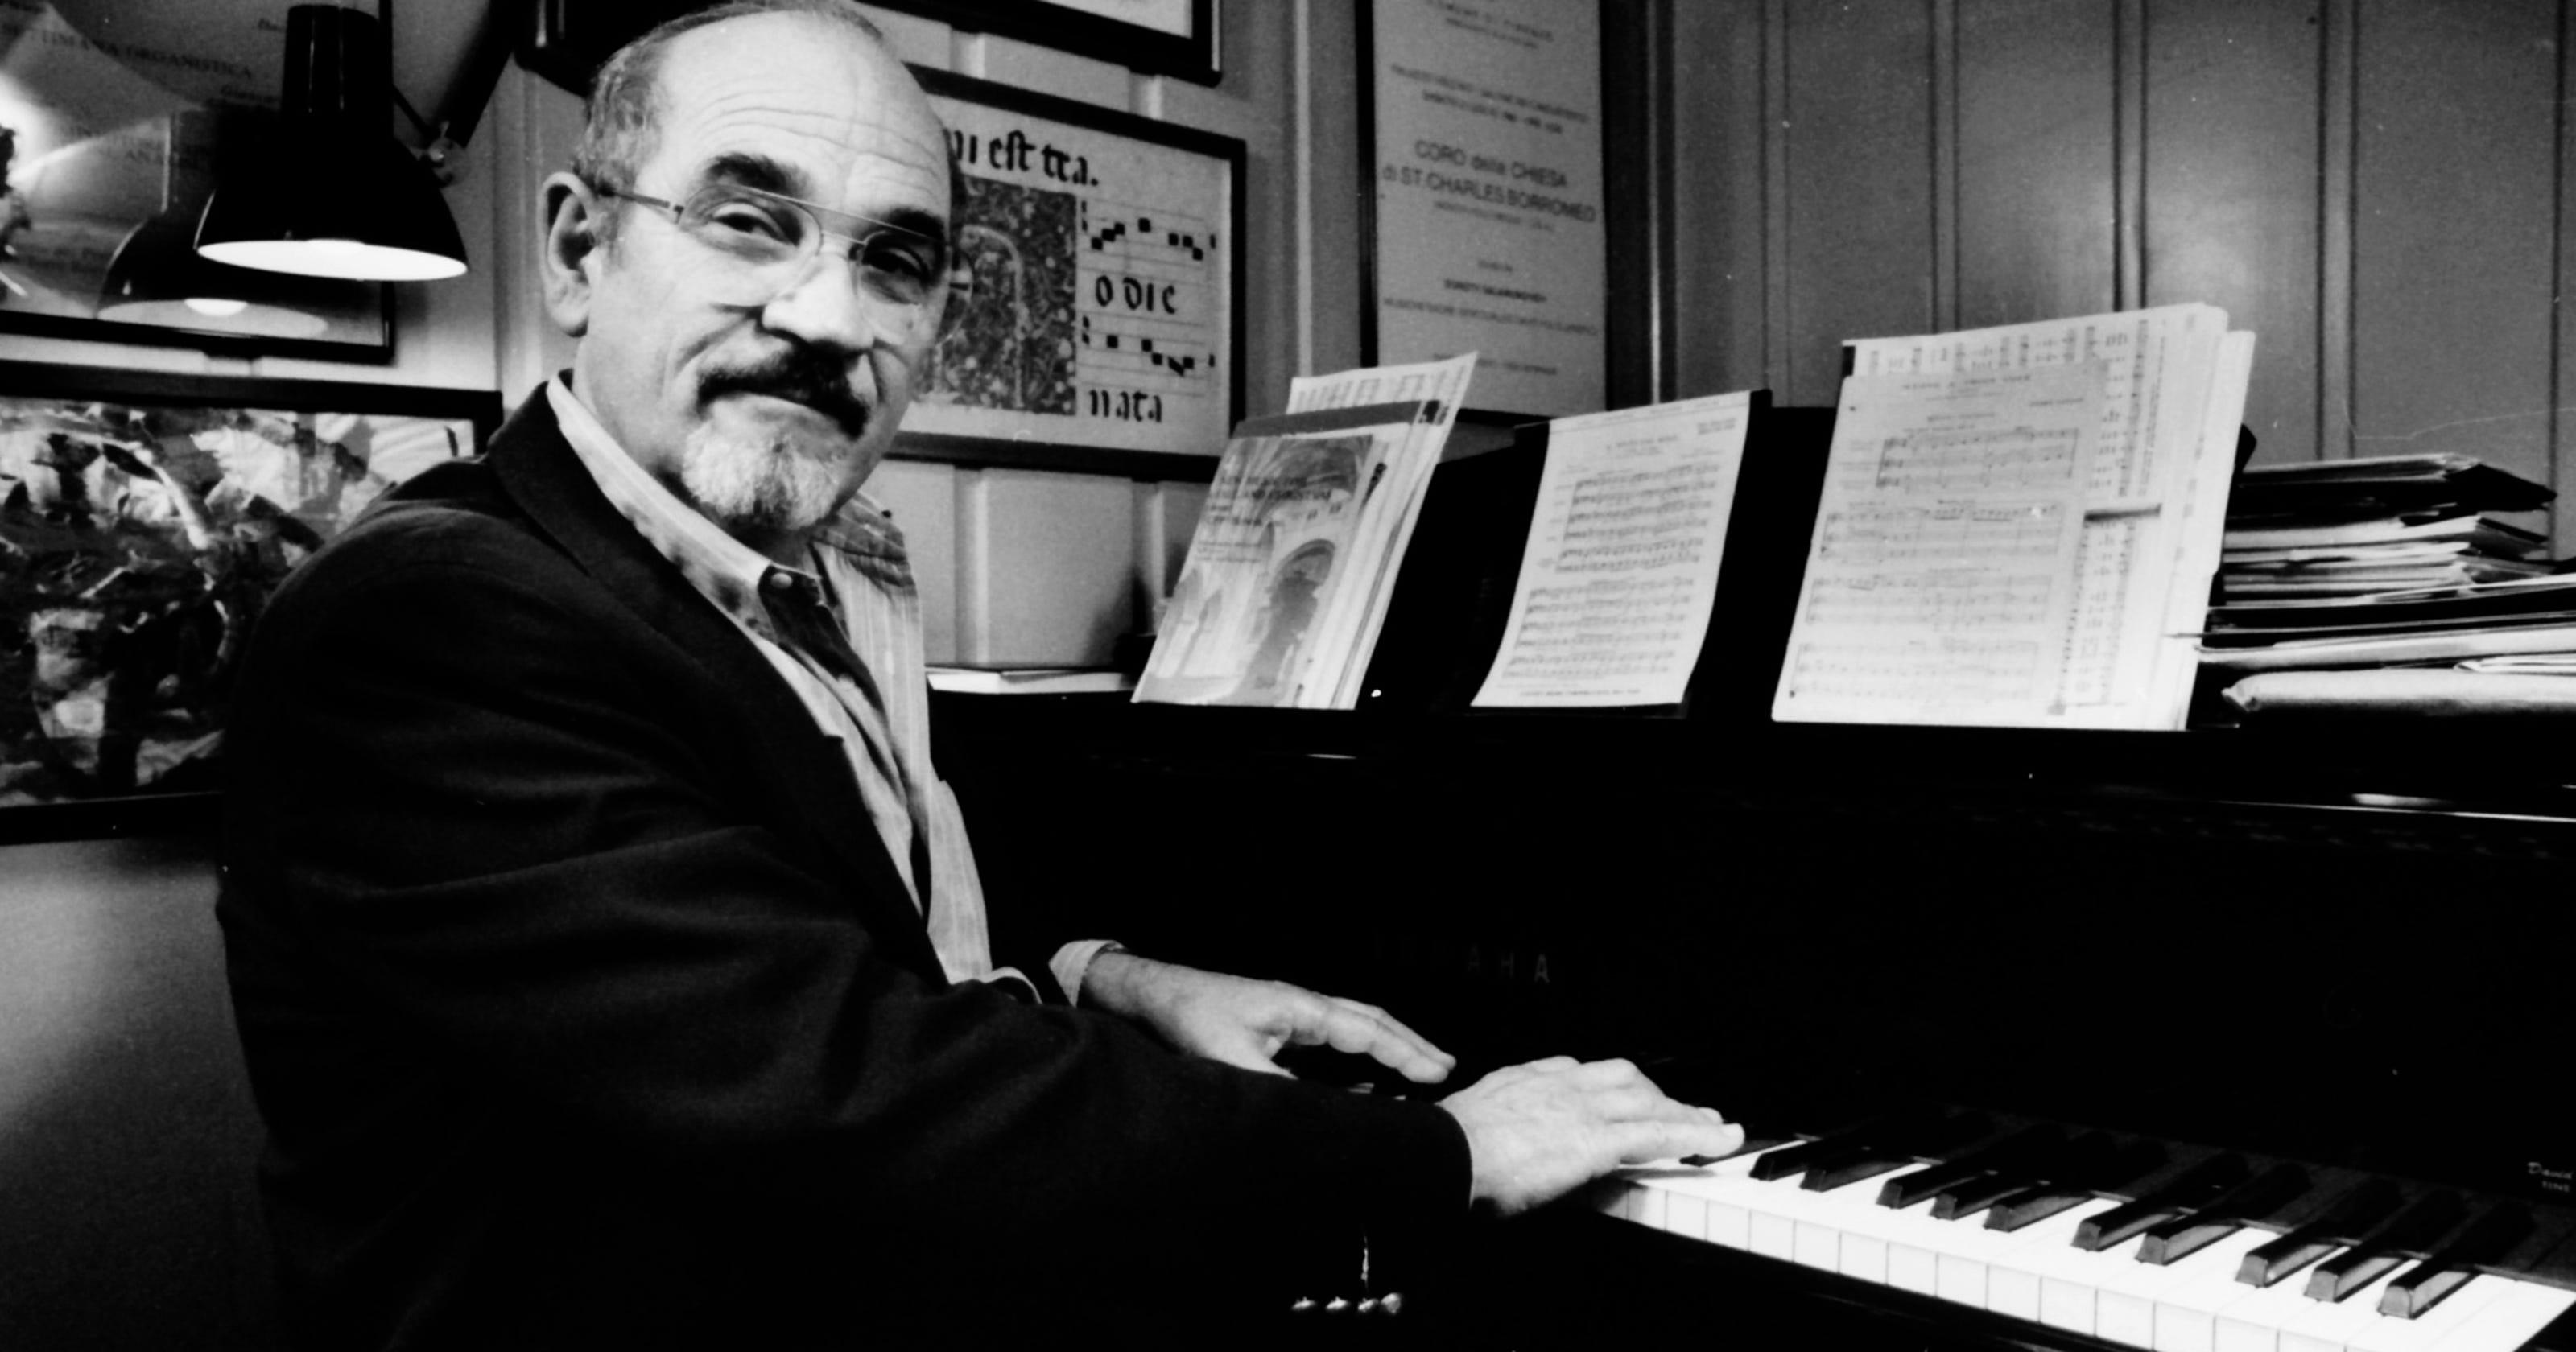 Chorus Director Paul Salamunovich Dies At 86 Coach Bennet Snoopy Saddle Authentic